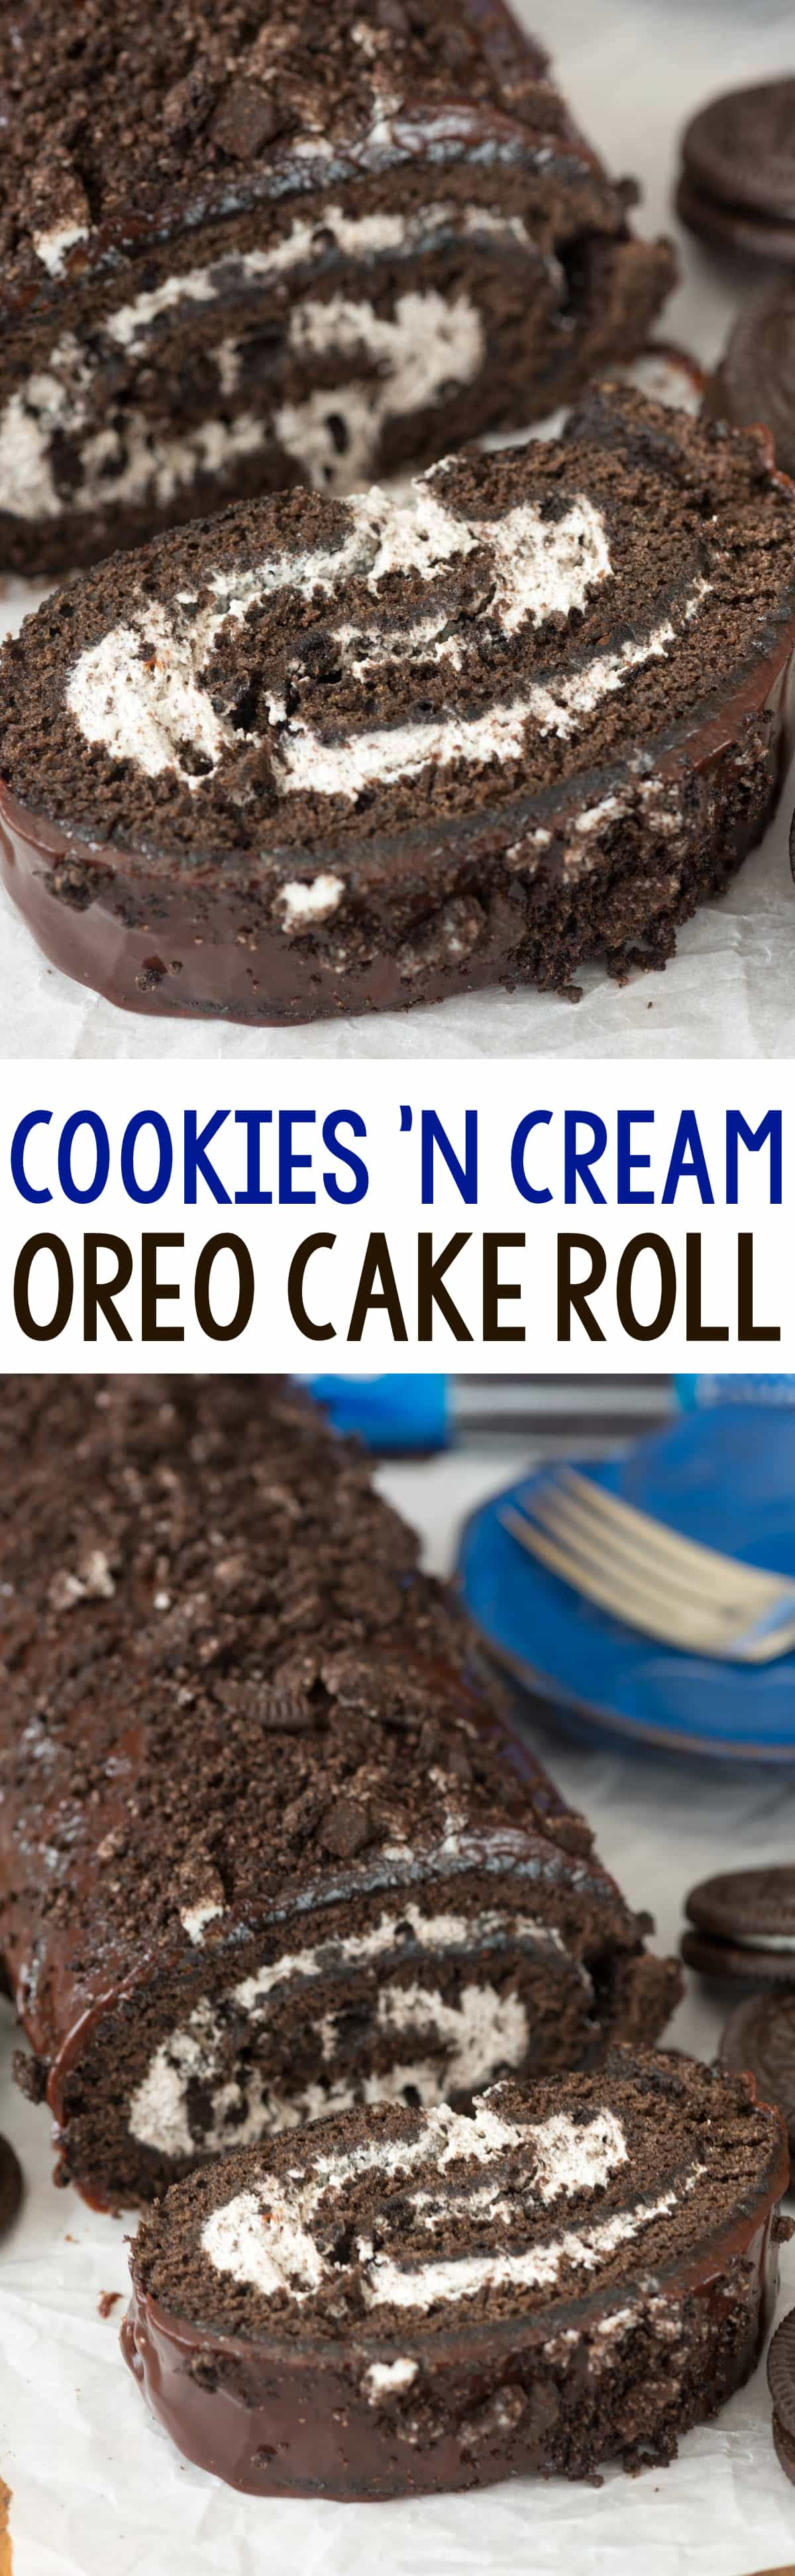 Cookies 'n Cream Oreo Cake Roll - Crazy for Crust